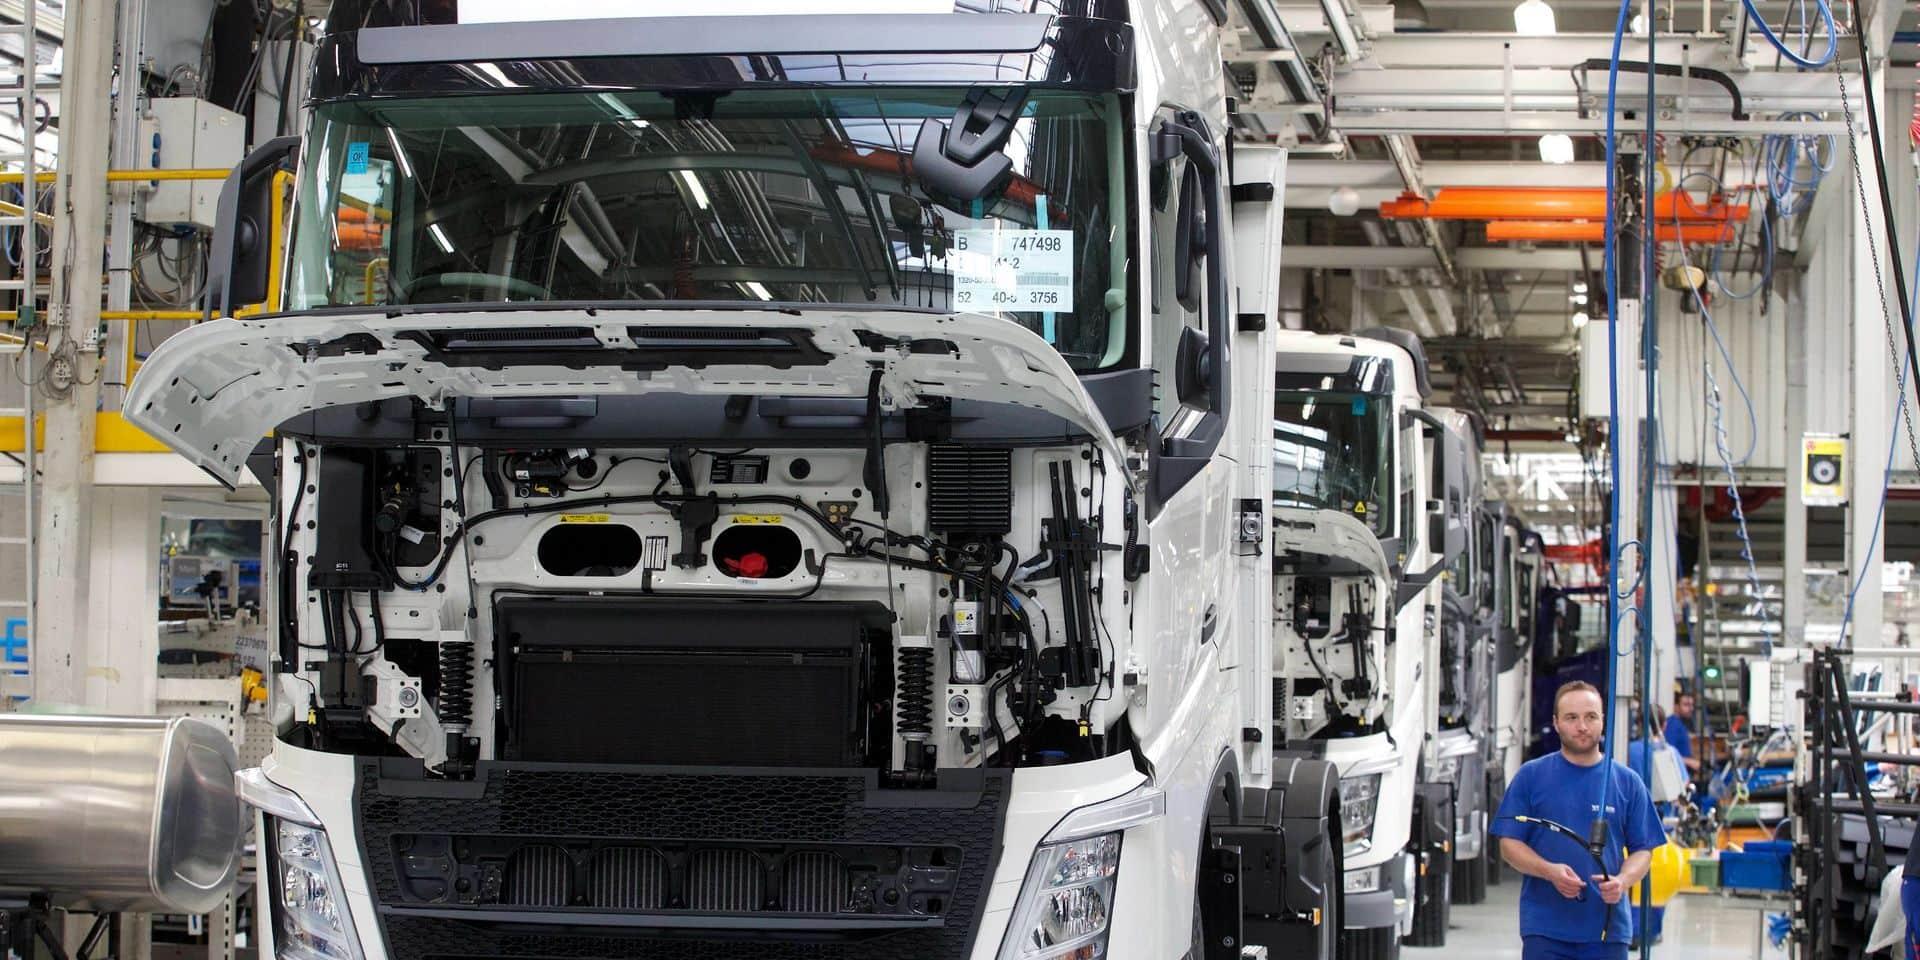 L'usine gantoise de Volvo Trucks devrait relancer sa production la semaine prochaine.